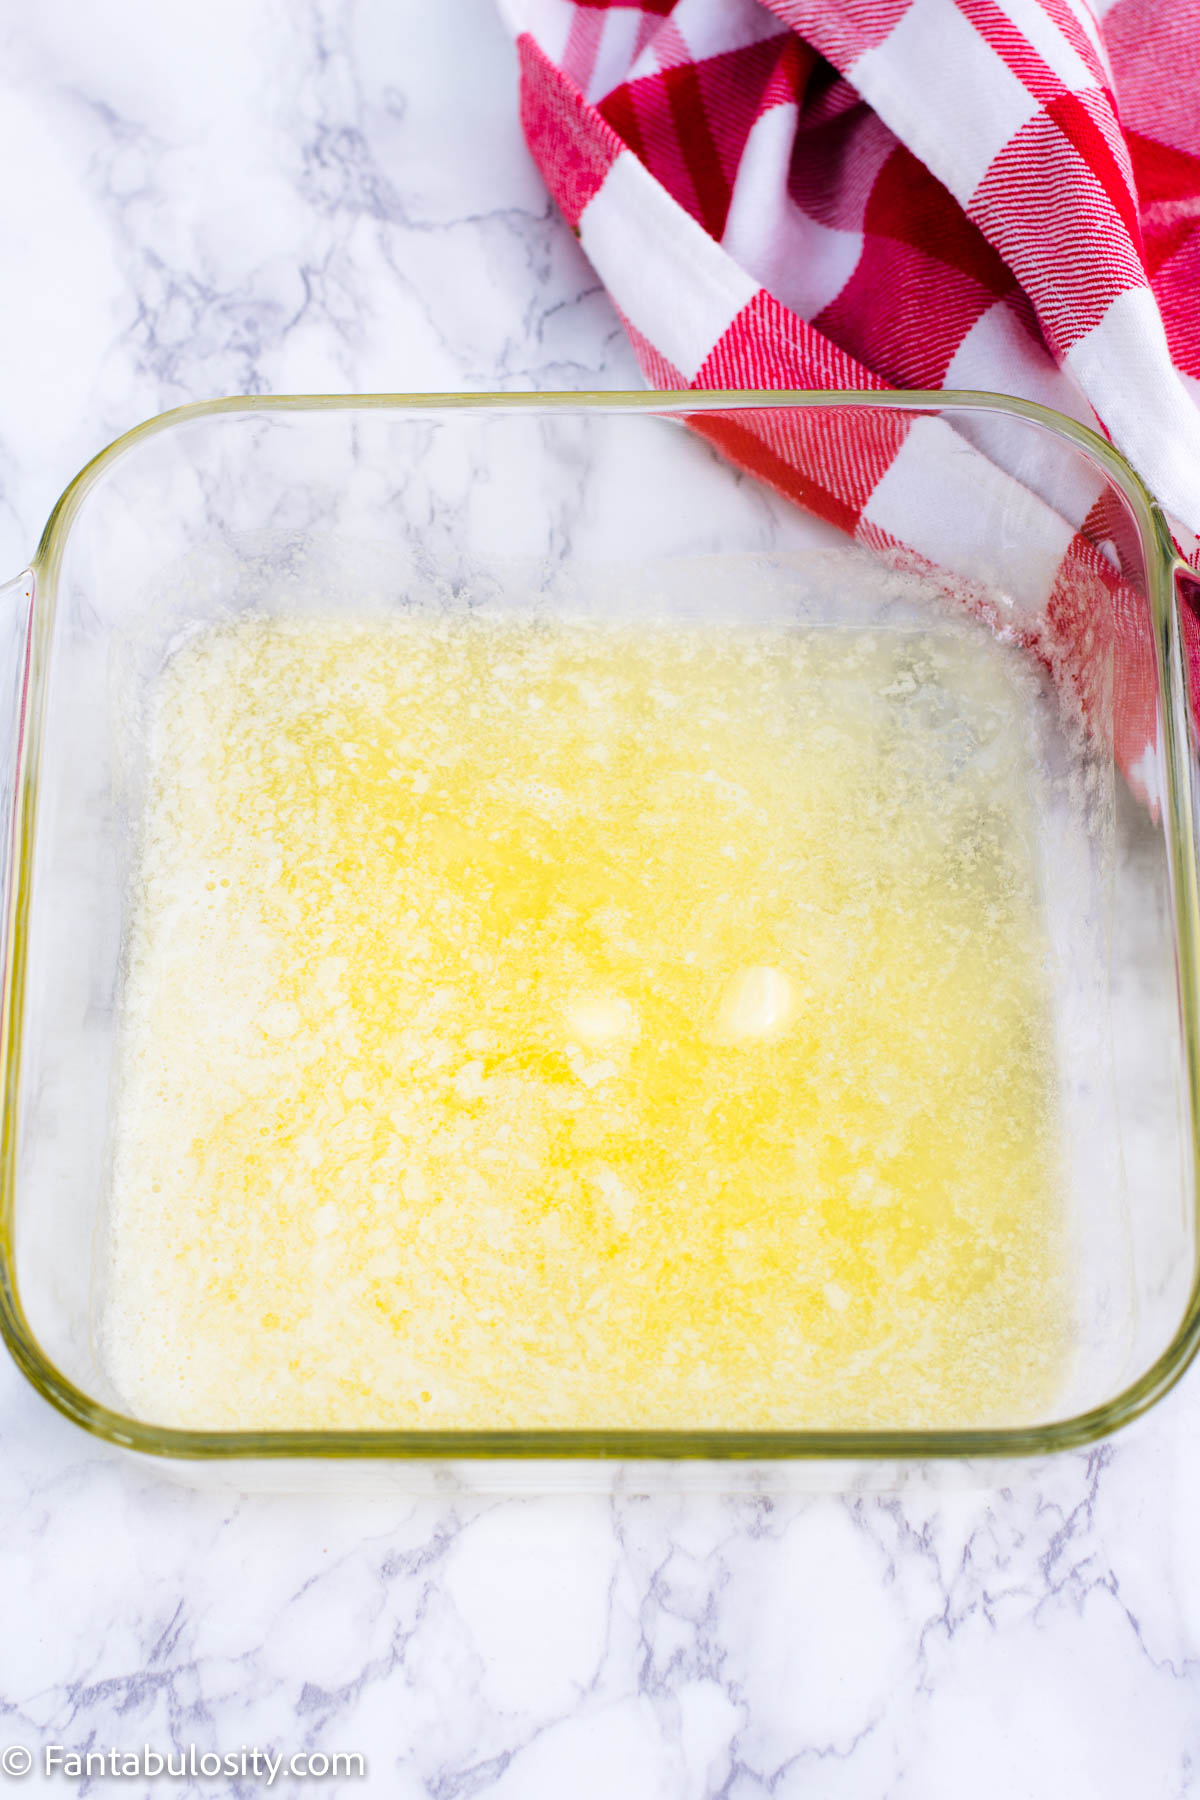 Melt butter in 8x8 baking dish